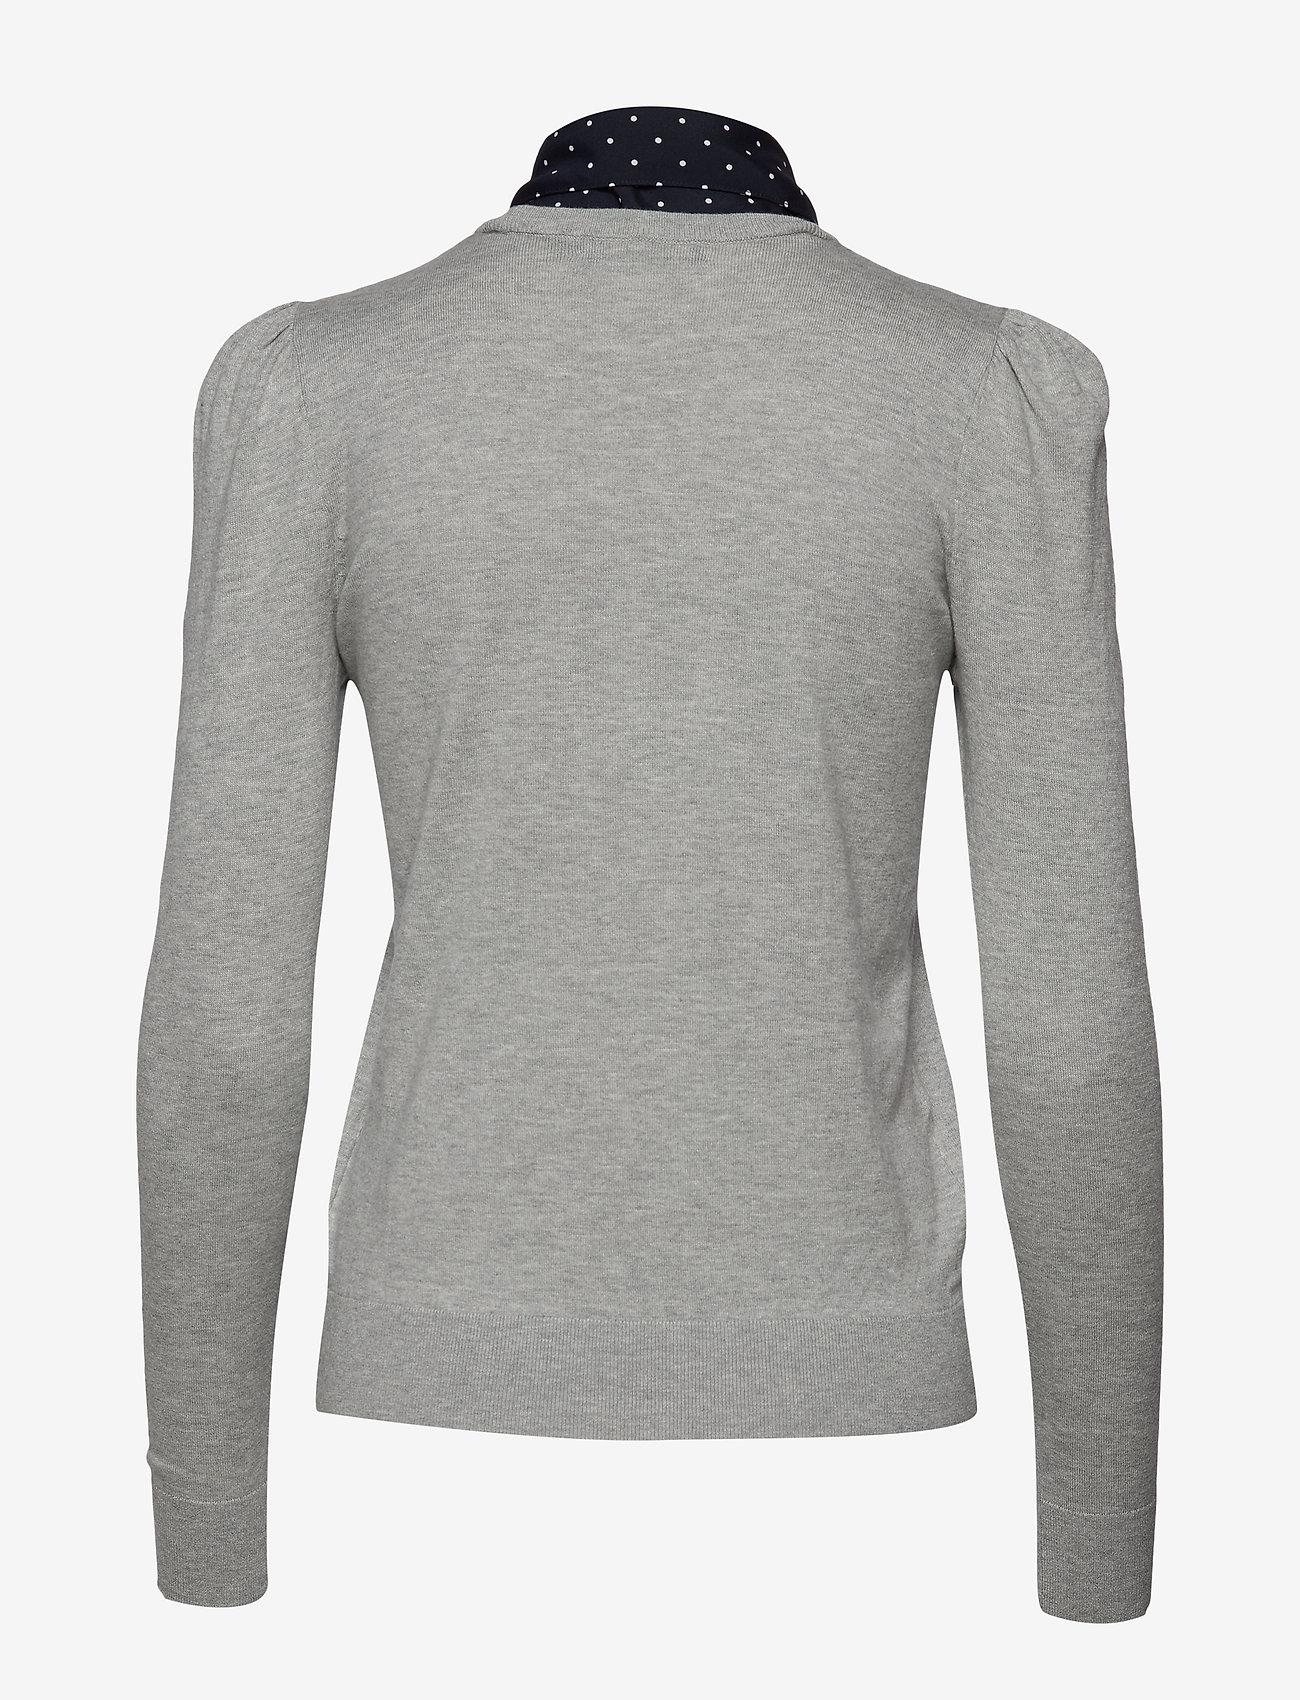 Neck-scarf Cotton Sweater (Pearl Grey Heathe) - Lauren Ralph Lauren 2BqoDi